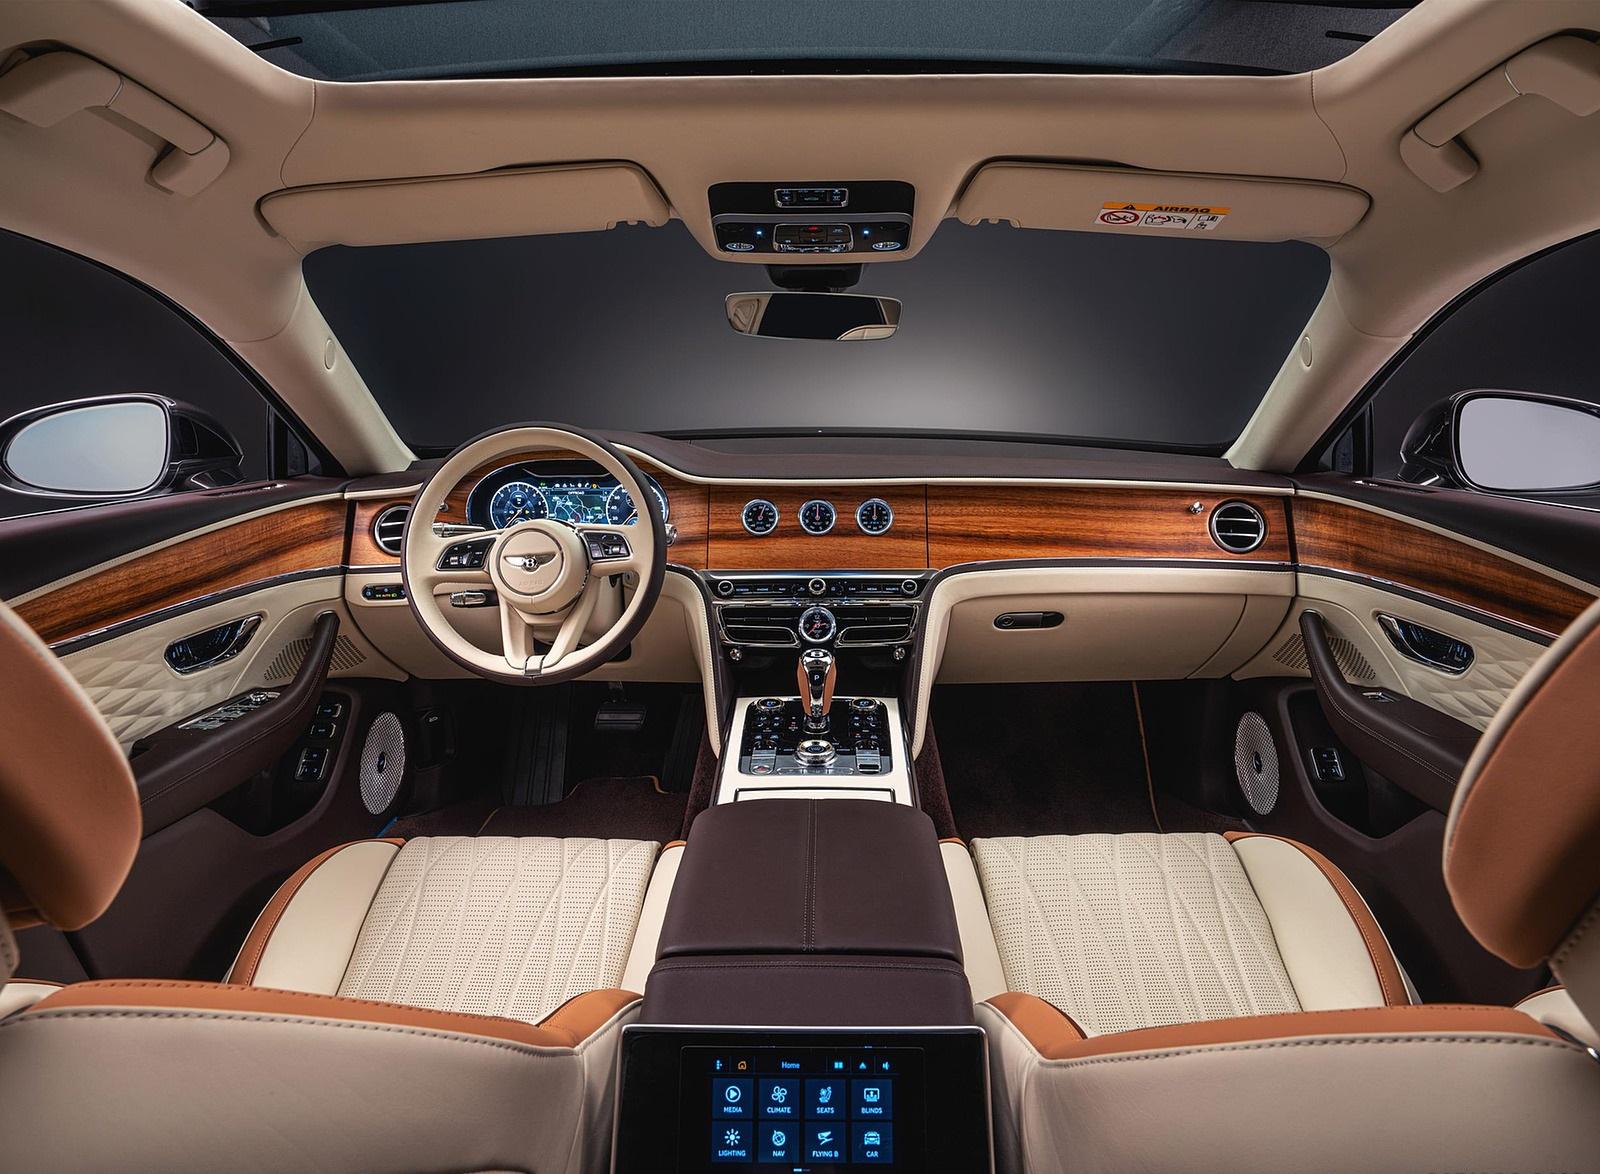 2022 Bentley Flying Spur Hybrid Odyssean Edition Interior Cockpit Wallpapers (7)